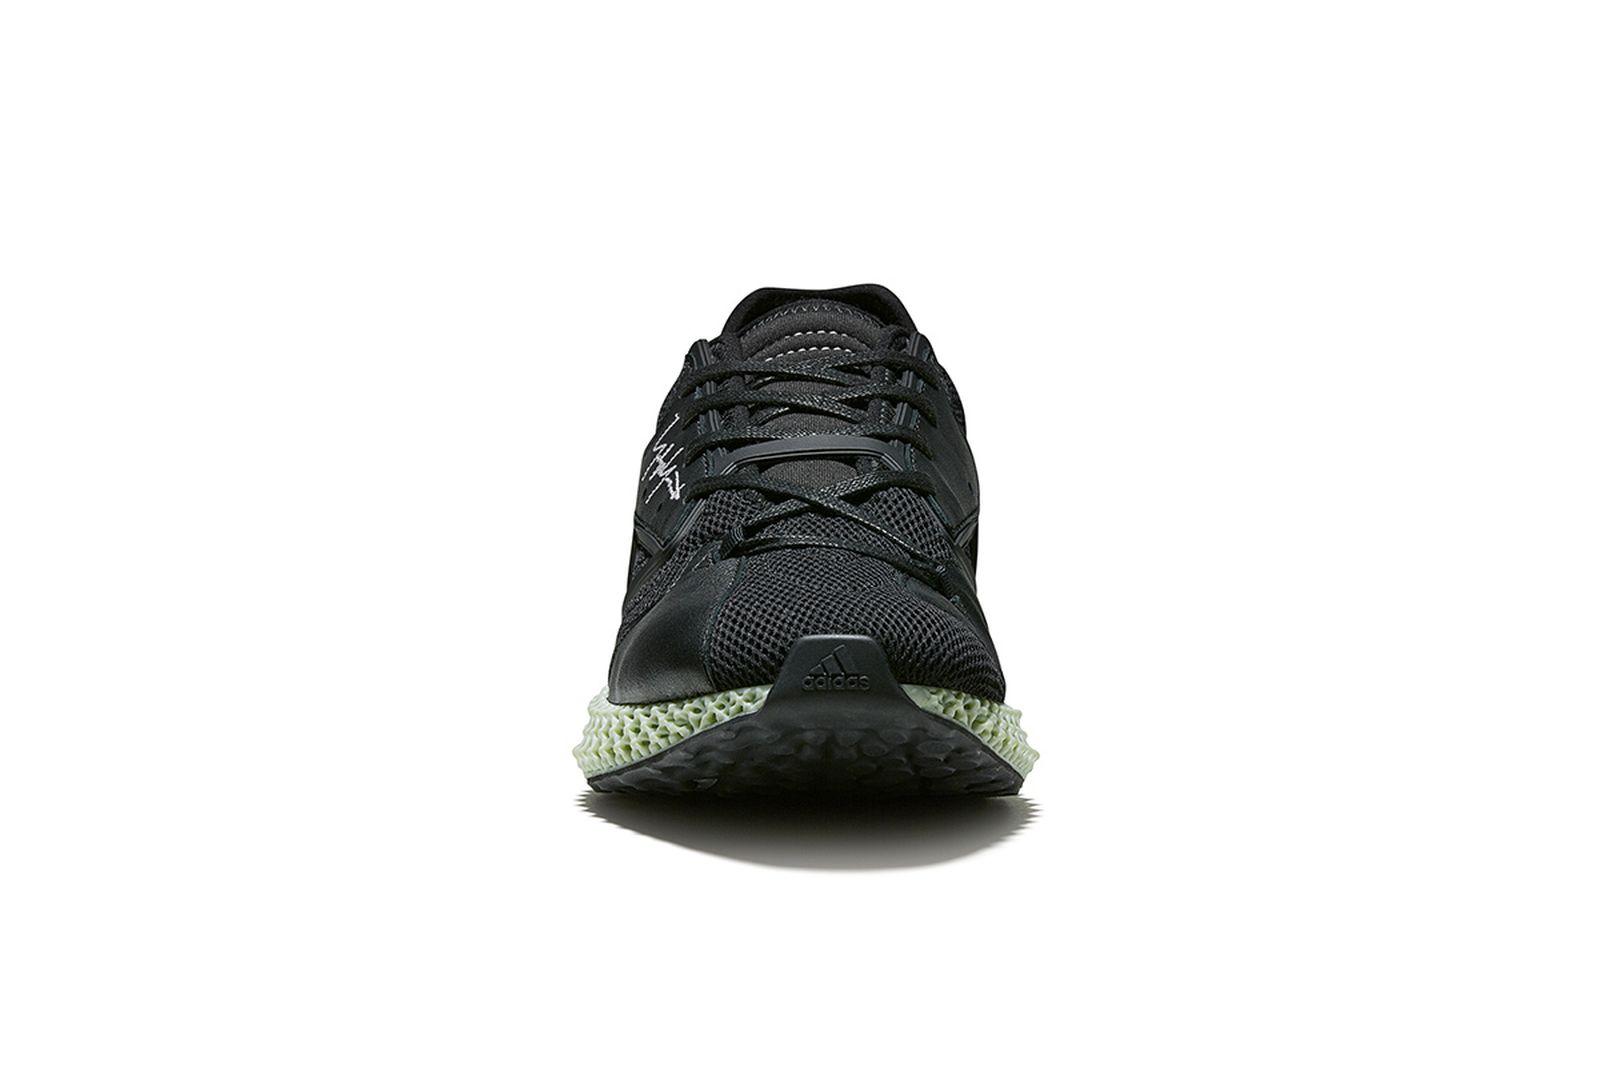 y3-runner-4d-release-date-price-02